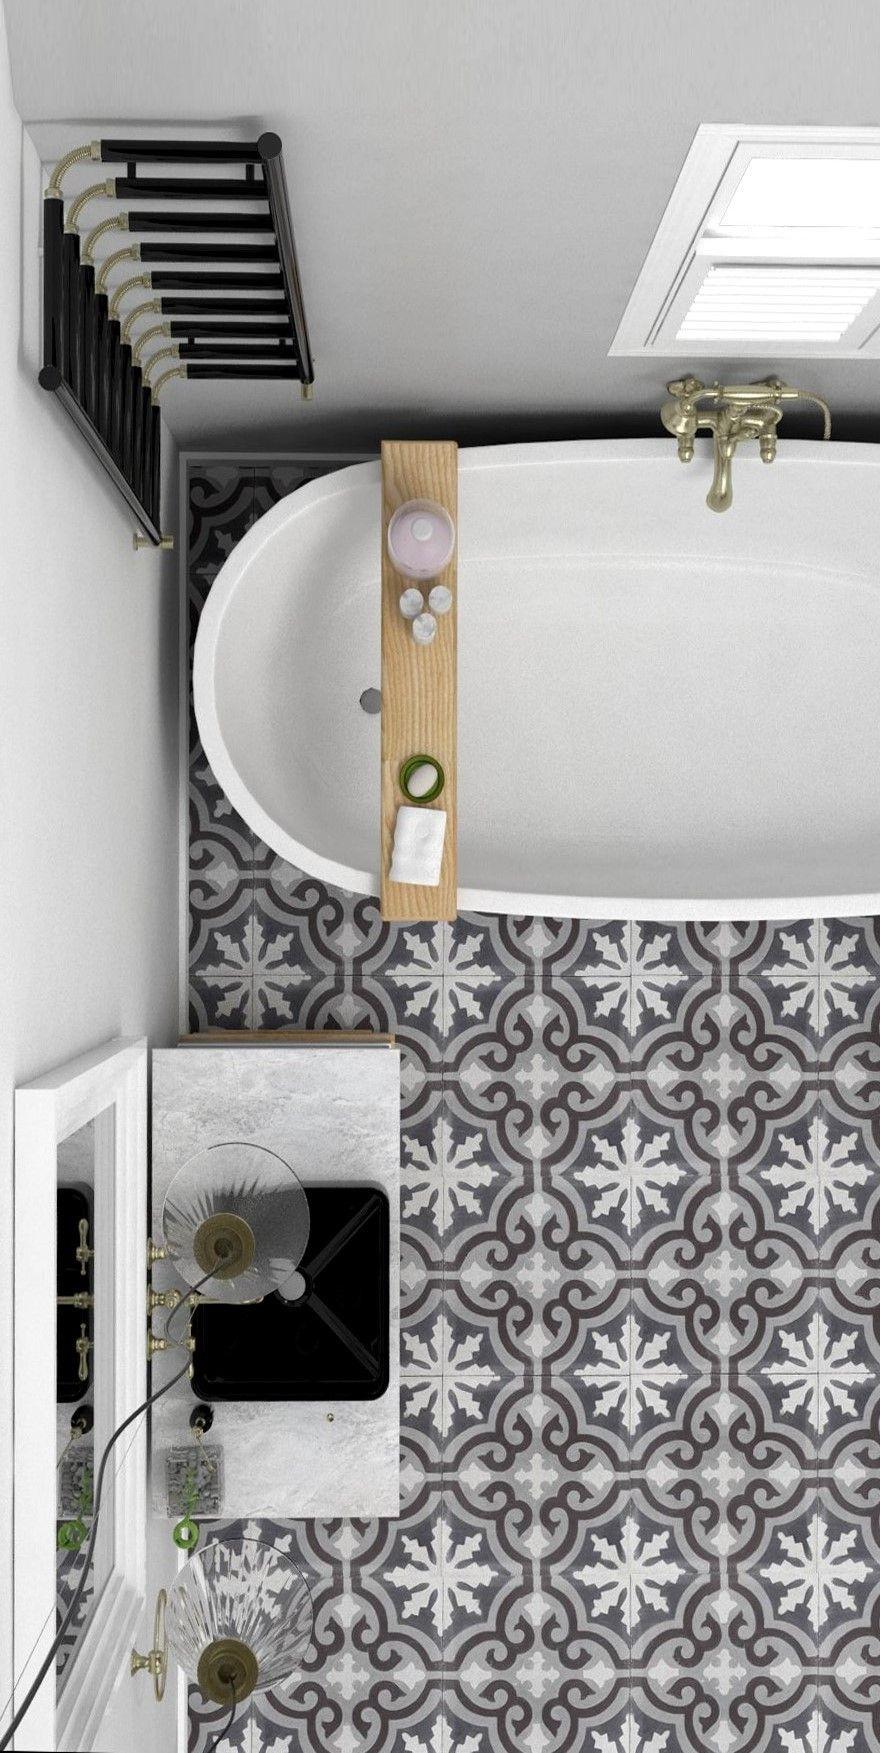 Badezimmerideen. Tolle Bodenfliesen mit ornamentalem Muster. #bad ...